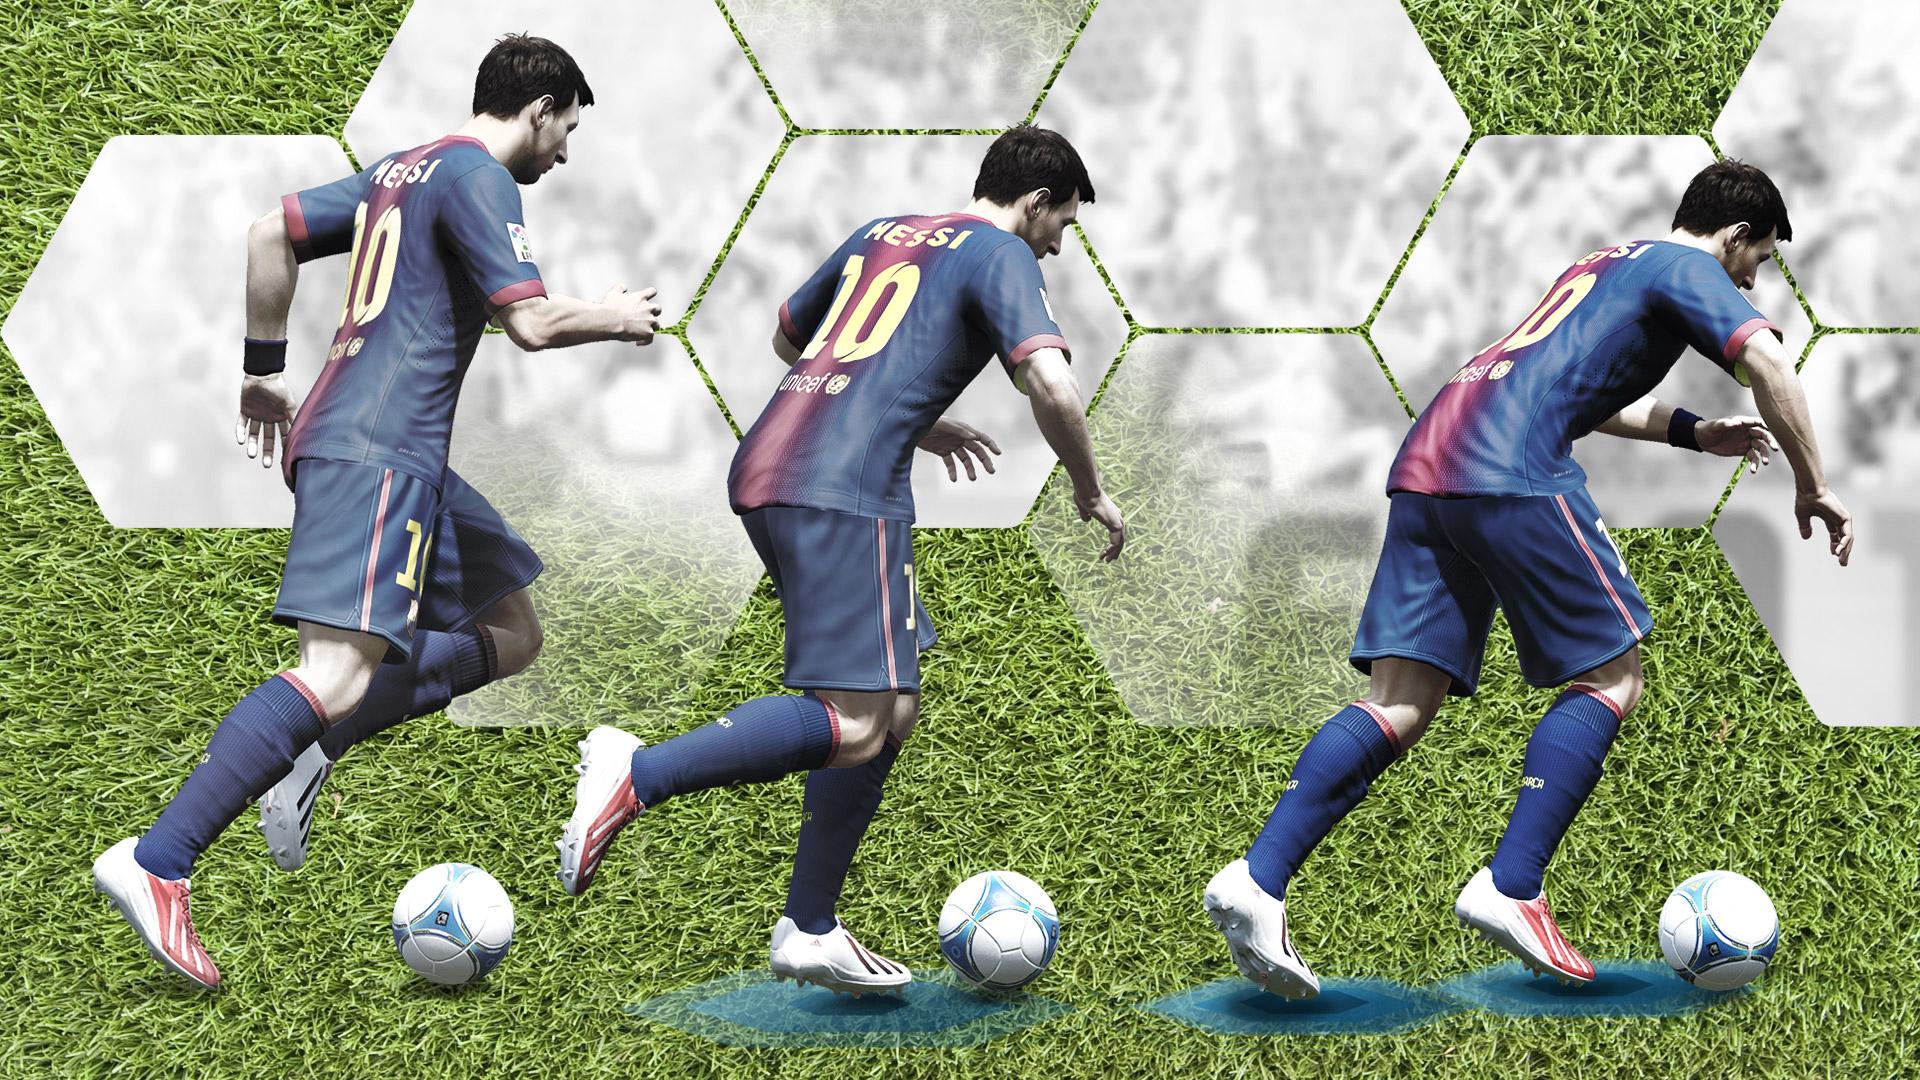 Free FIFA 14 Wallpaper in 1920x1080